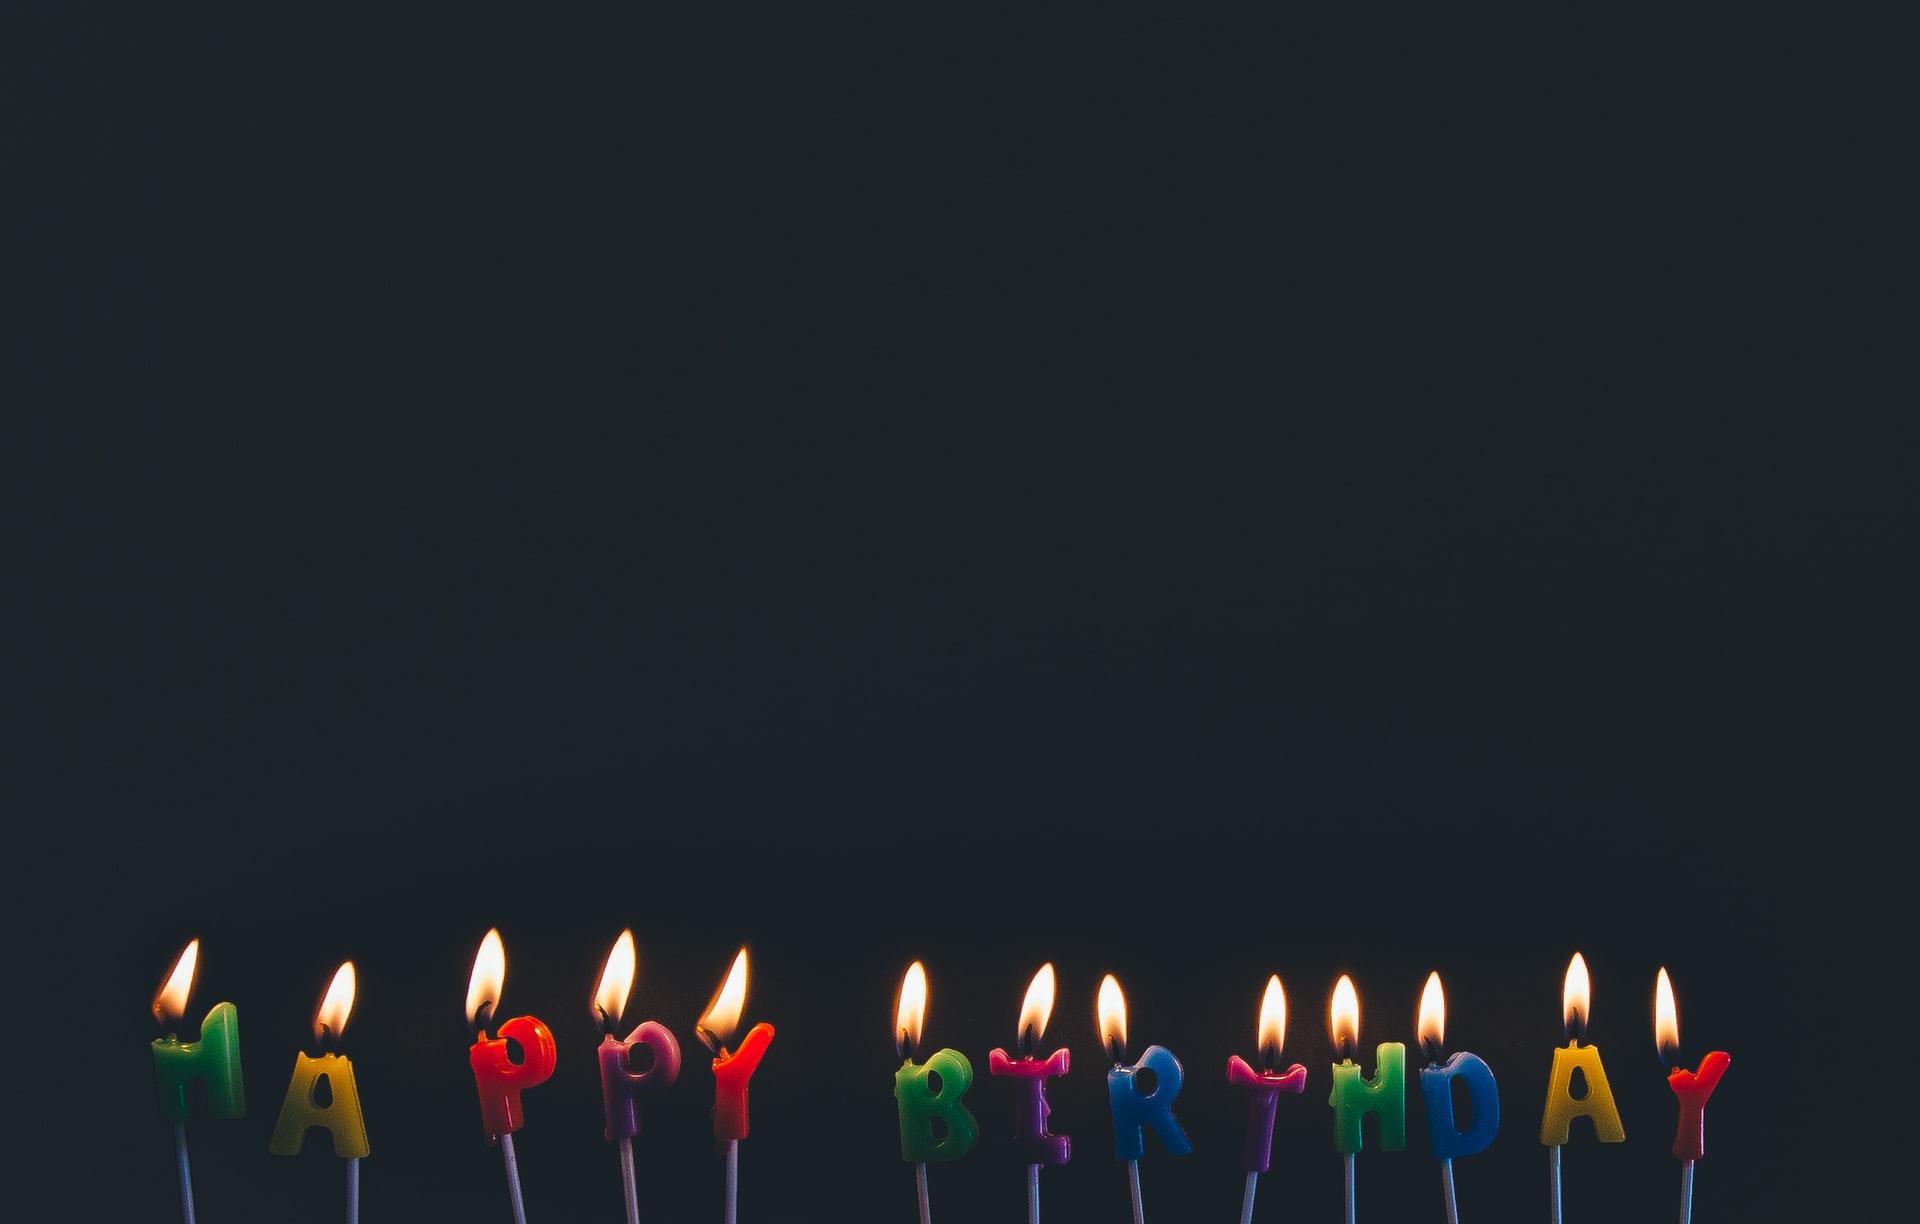 5 Simple Ways to Celebrate a Friend's Birthday